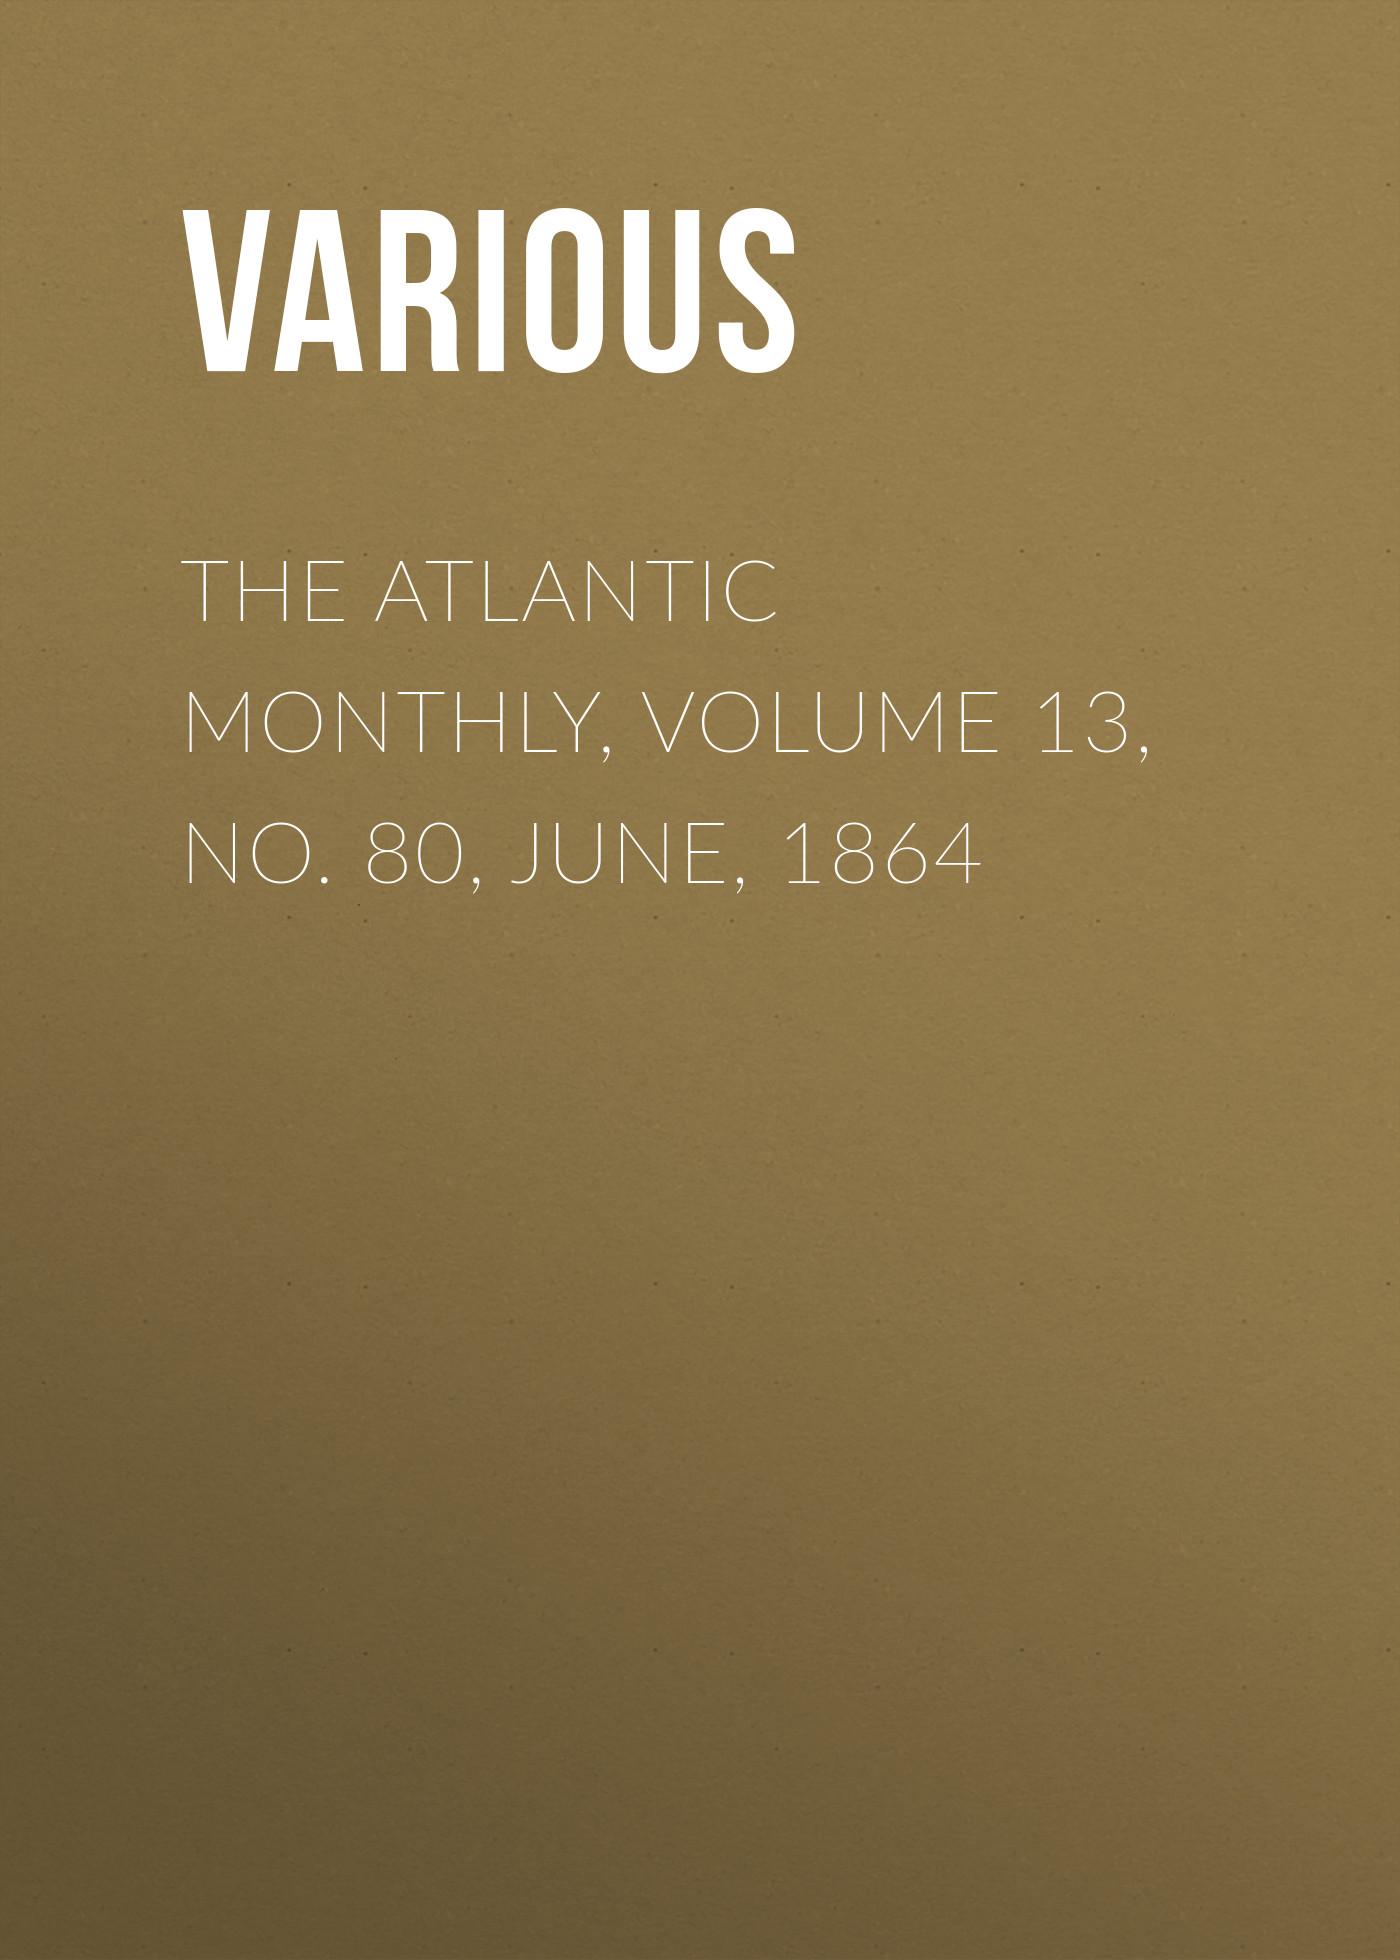 The Atlantic Monthly, Volume 13, No. 80, June, 1864